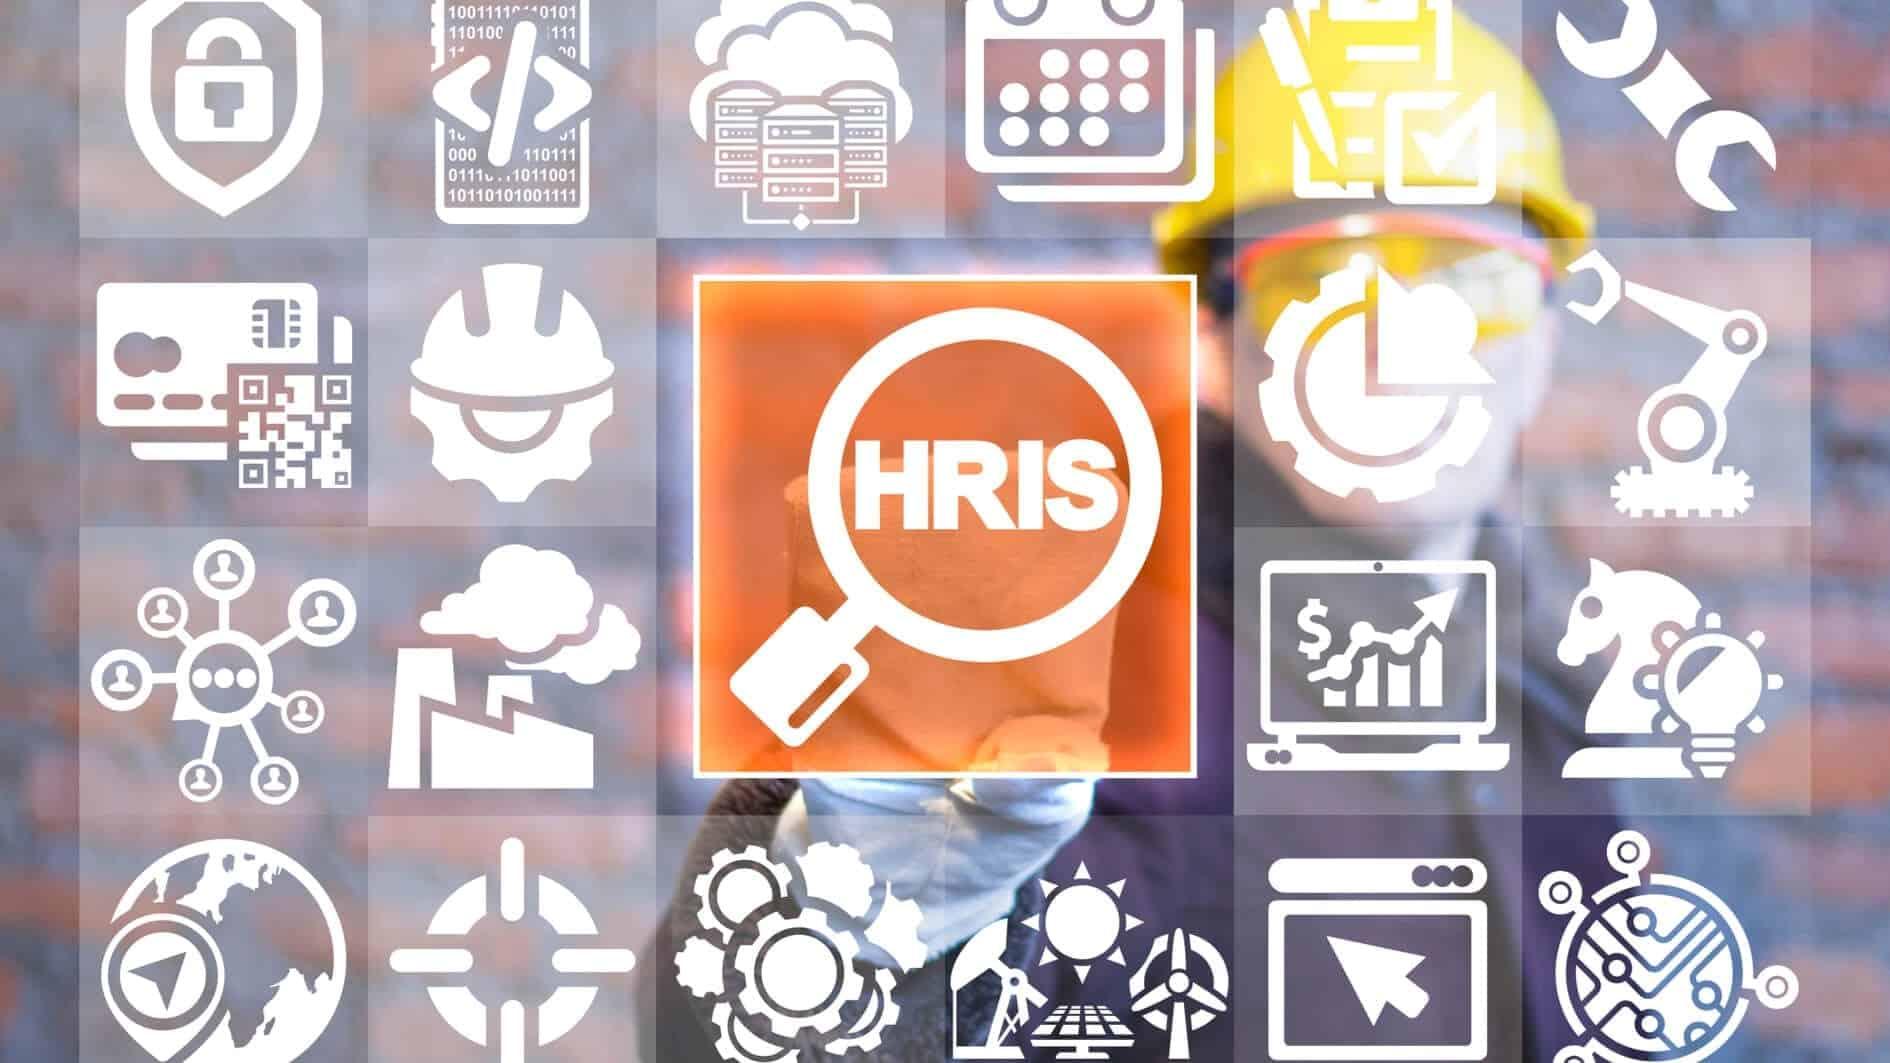 Manfaat Aplikasi HR untuk Perusahaan: Hitung Gaji Sampai Absensi